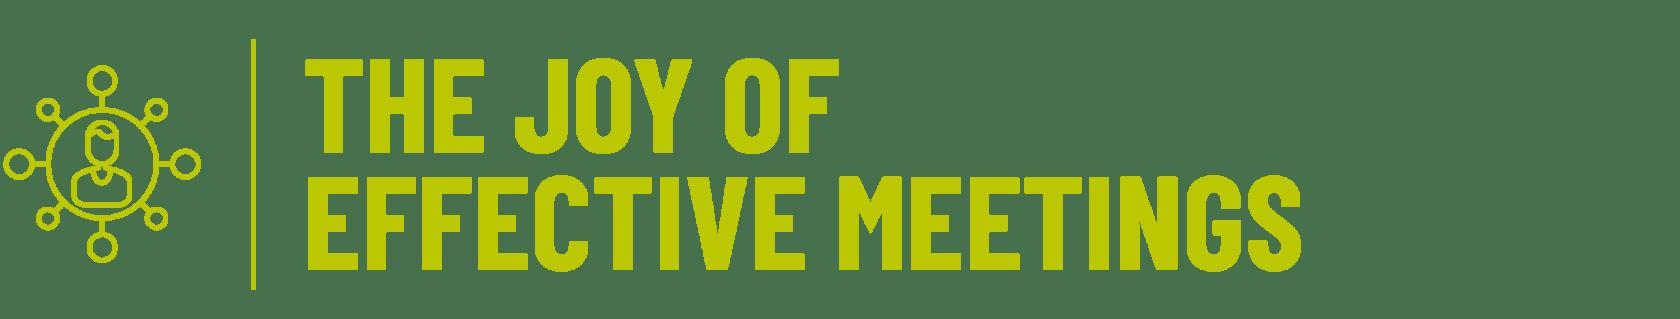 Header_Management_IN-Joy_Effective_Meeting_Tavola disegno 1